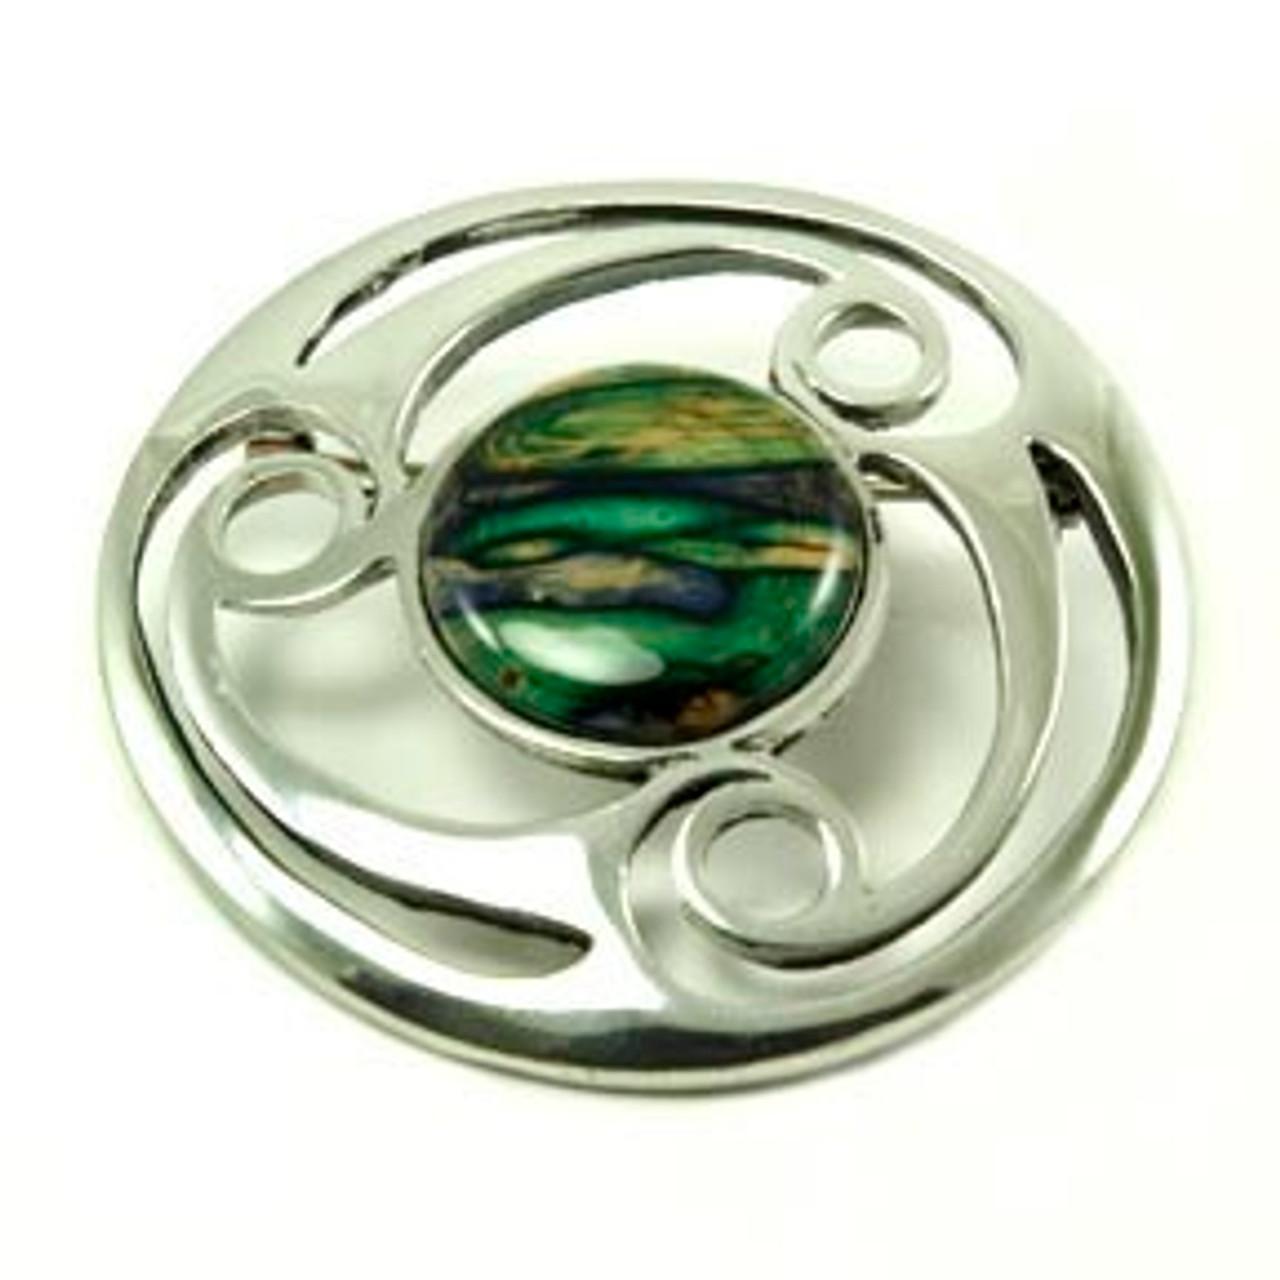 Celtic Spiral Brooch